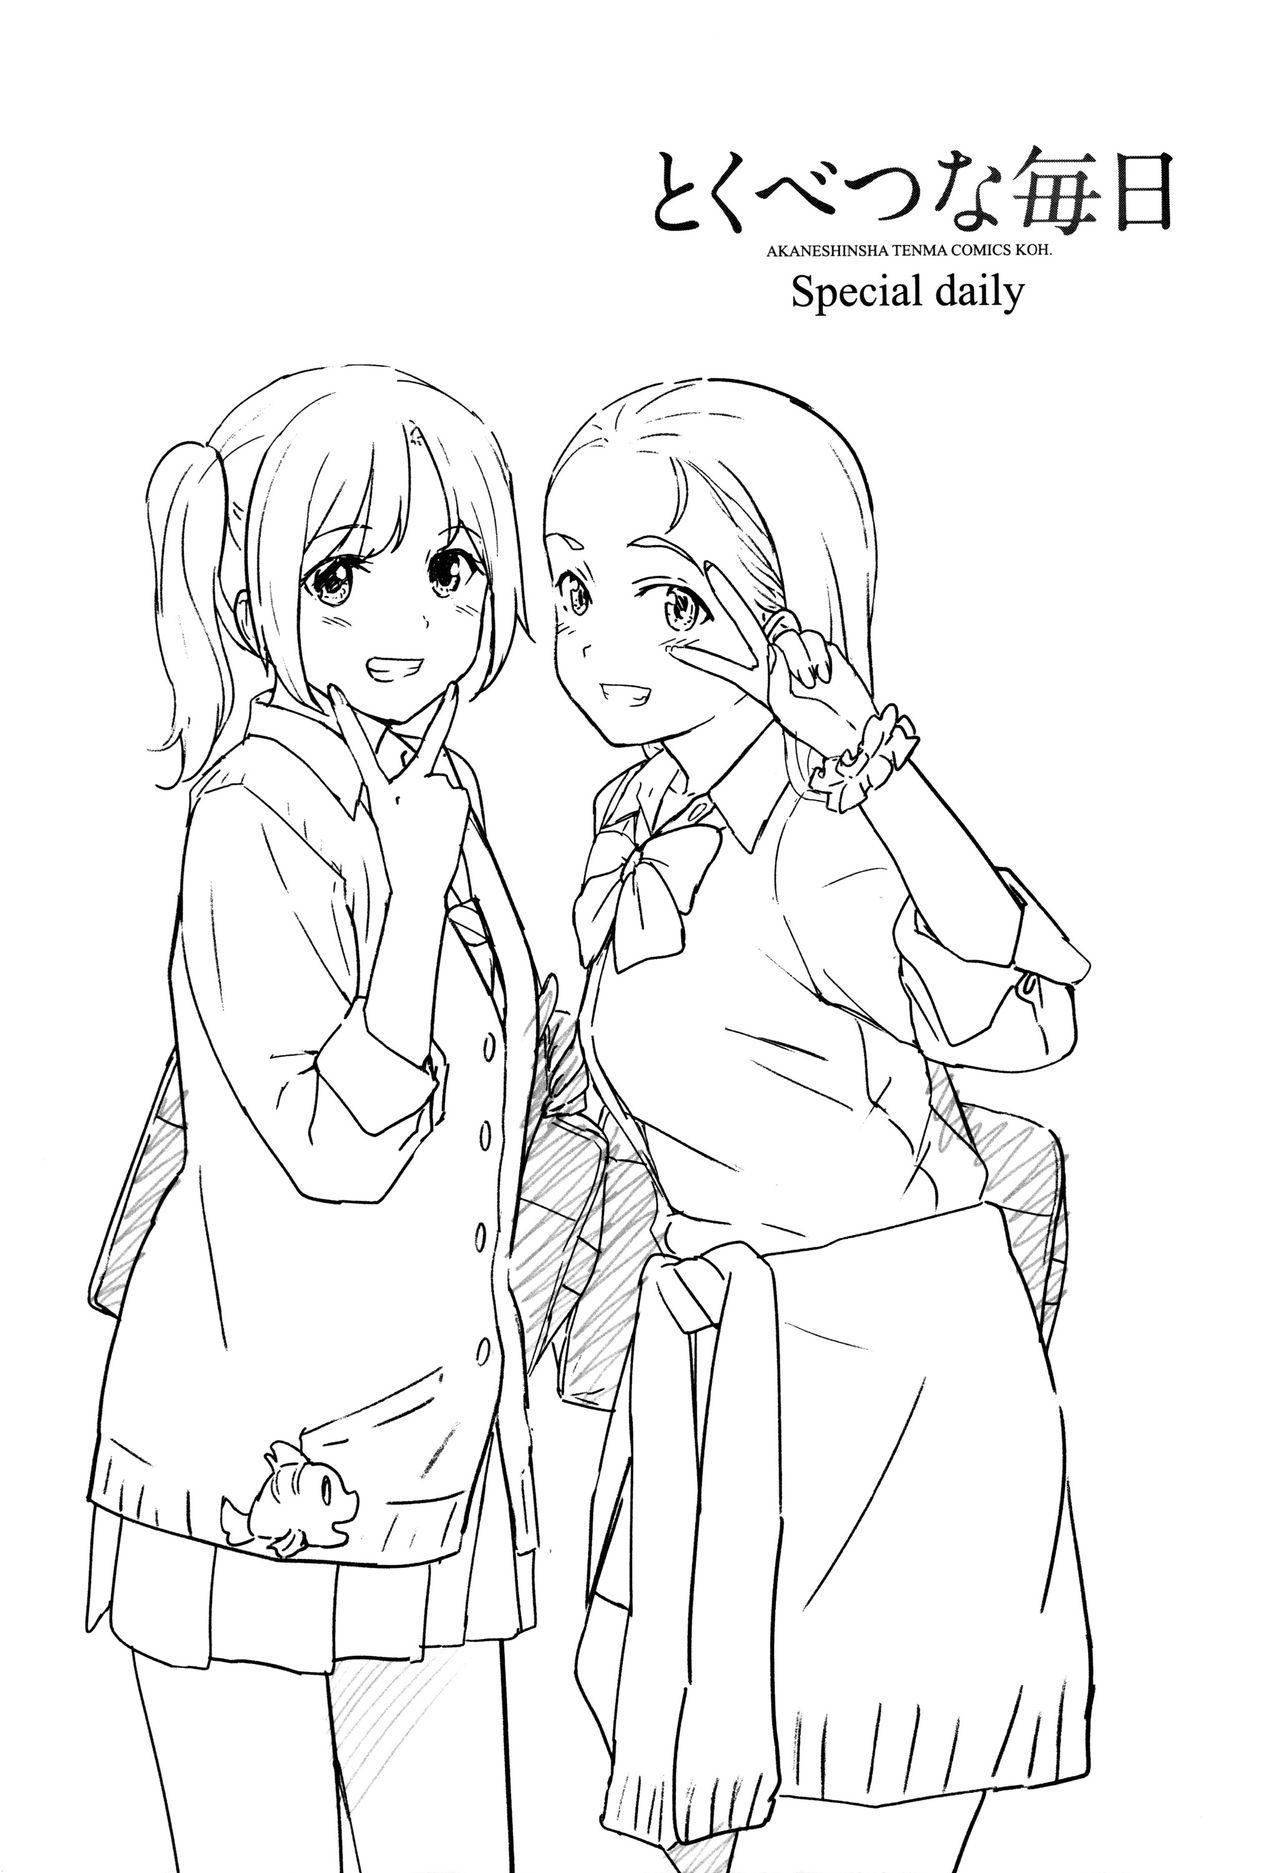 Tokubetsu na Mainichi - Special daily 89